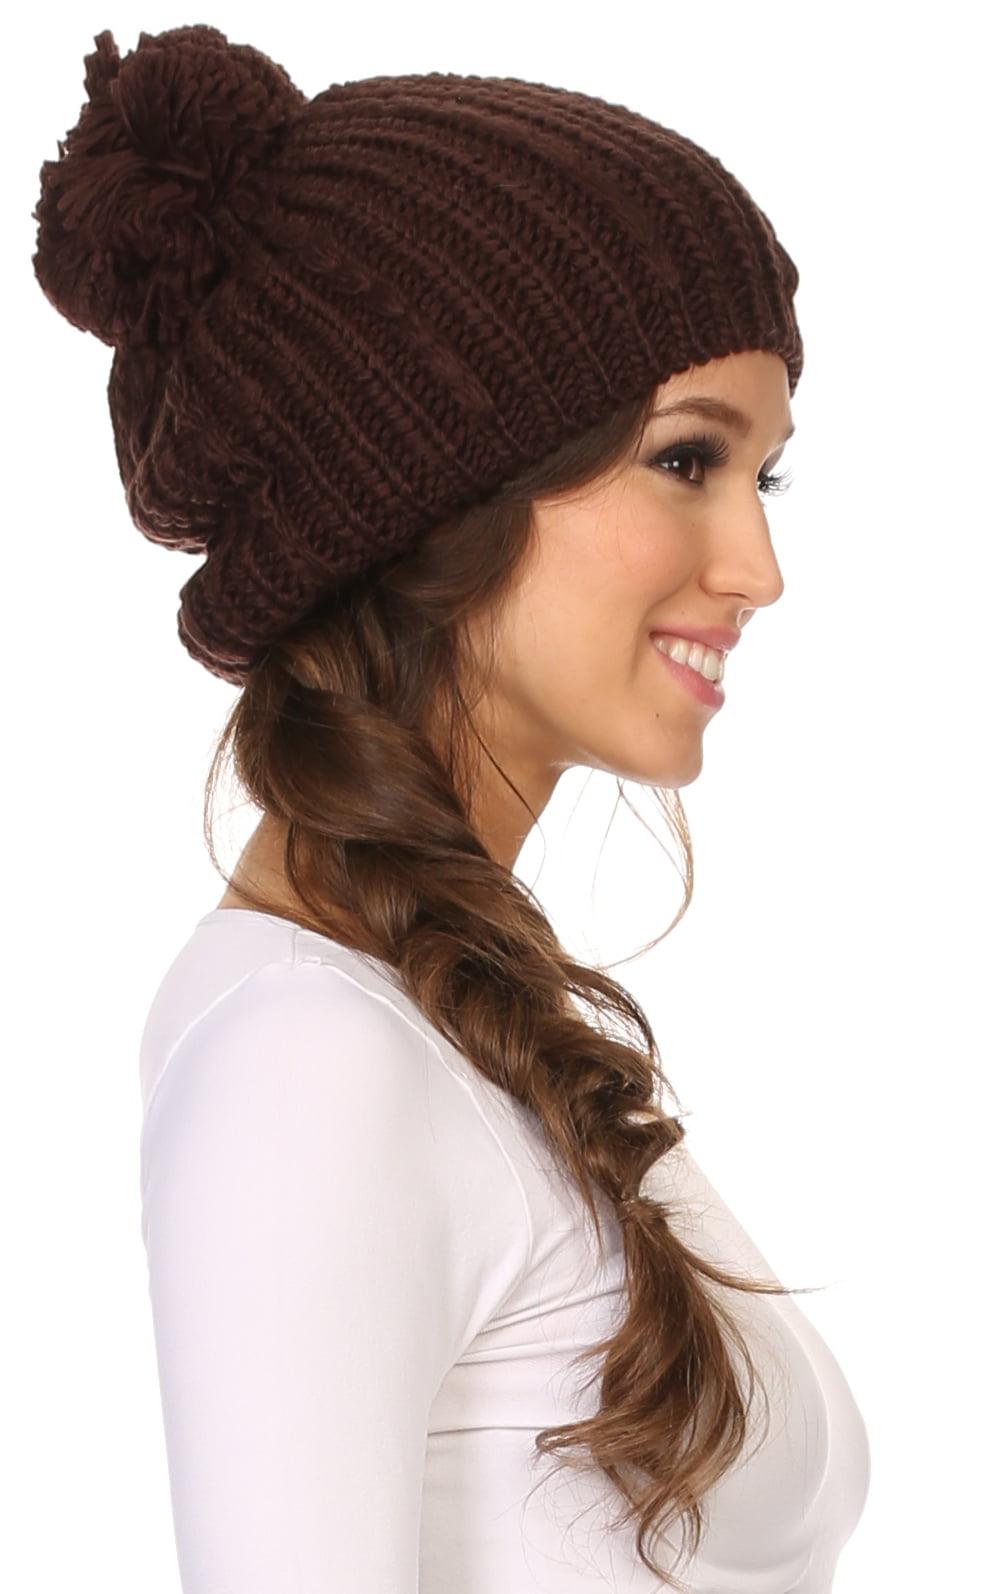 edbd71128b6 Sakkas Lax Wide Unisex Cable Knit Large Pom Pom Bobble Beanie Hat Cap -  Brown - OS - Walmart.com